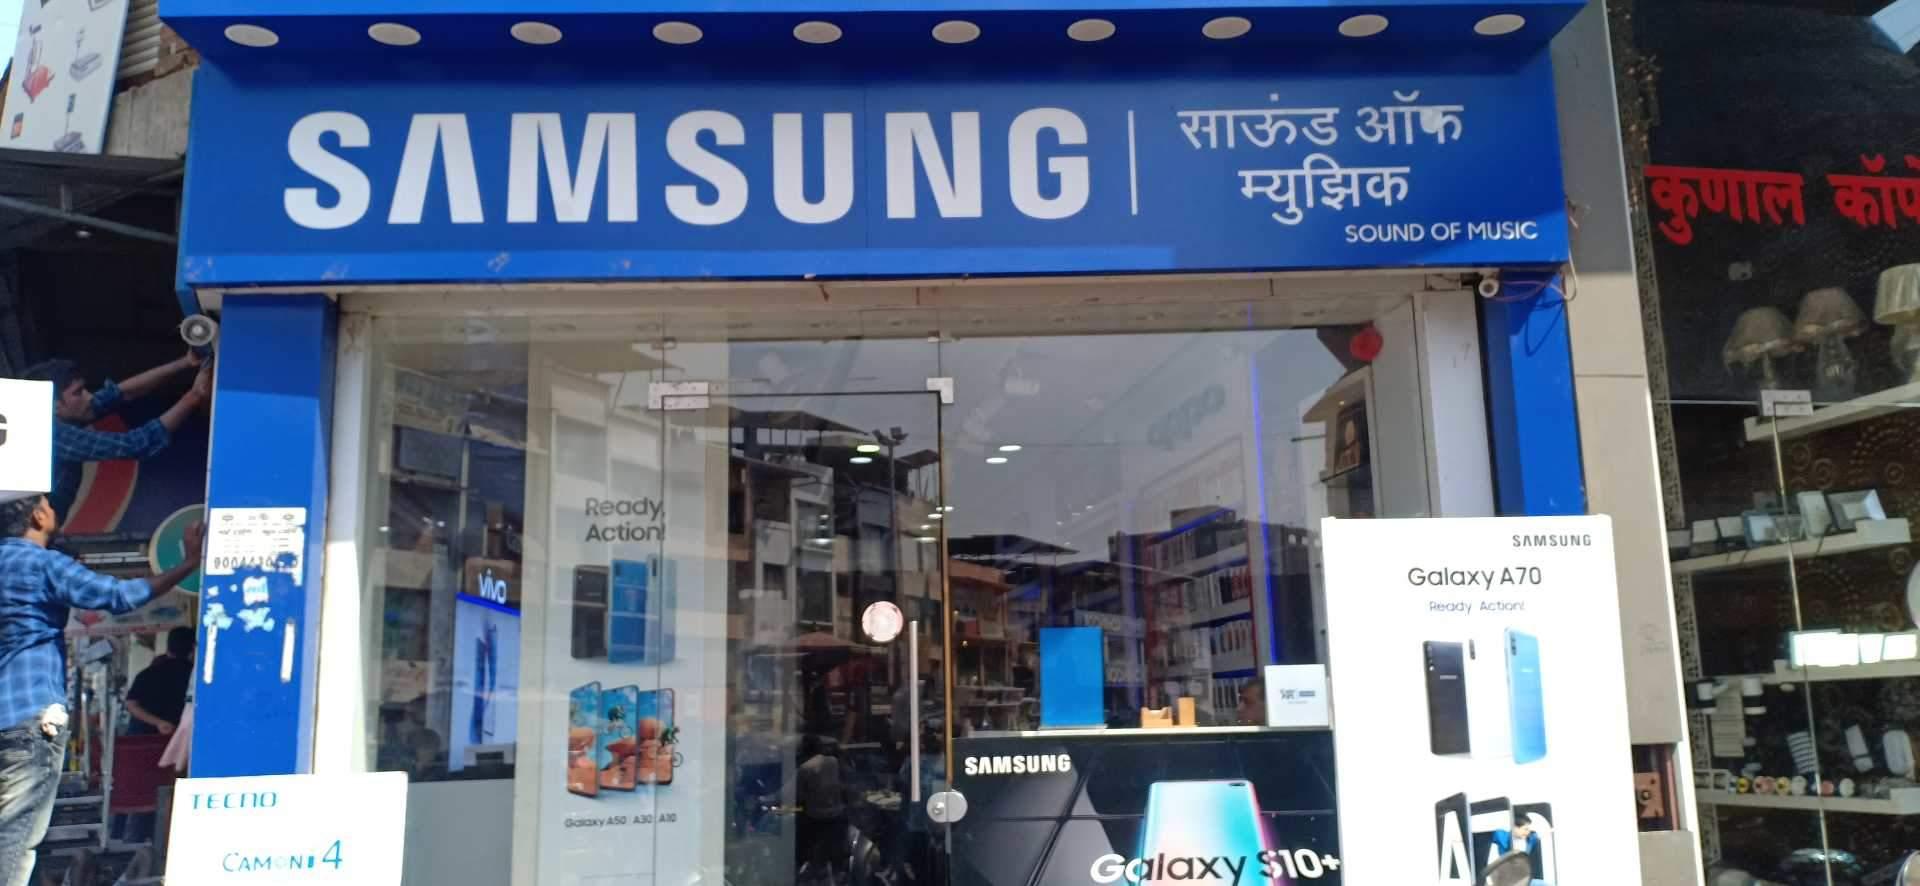 Top 50 Samsung Mobile Phone Dealers in Ulhasnagar No 3 - Best